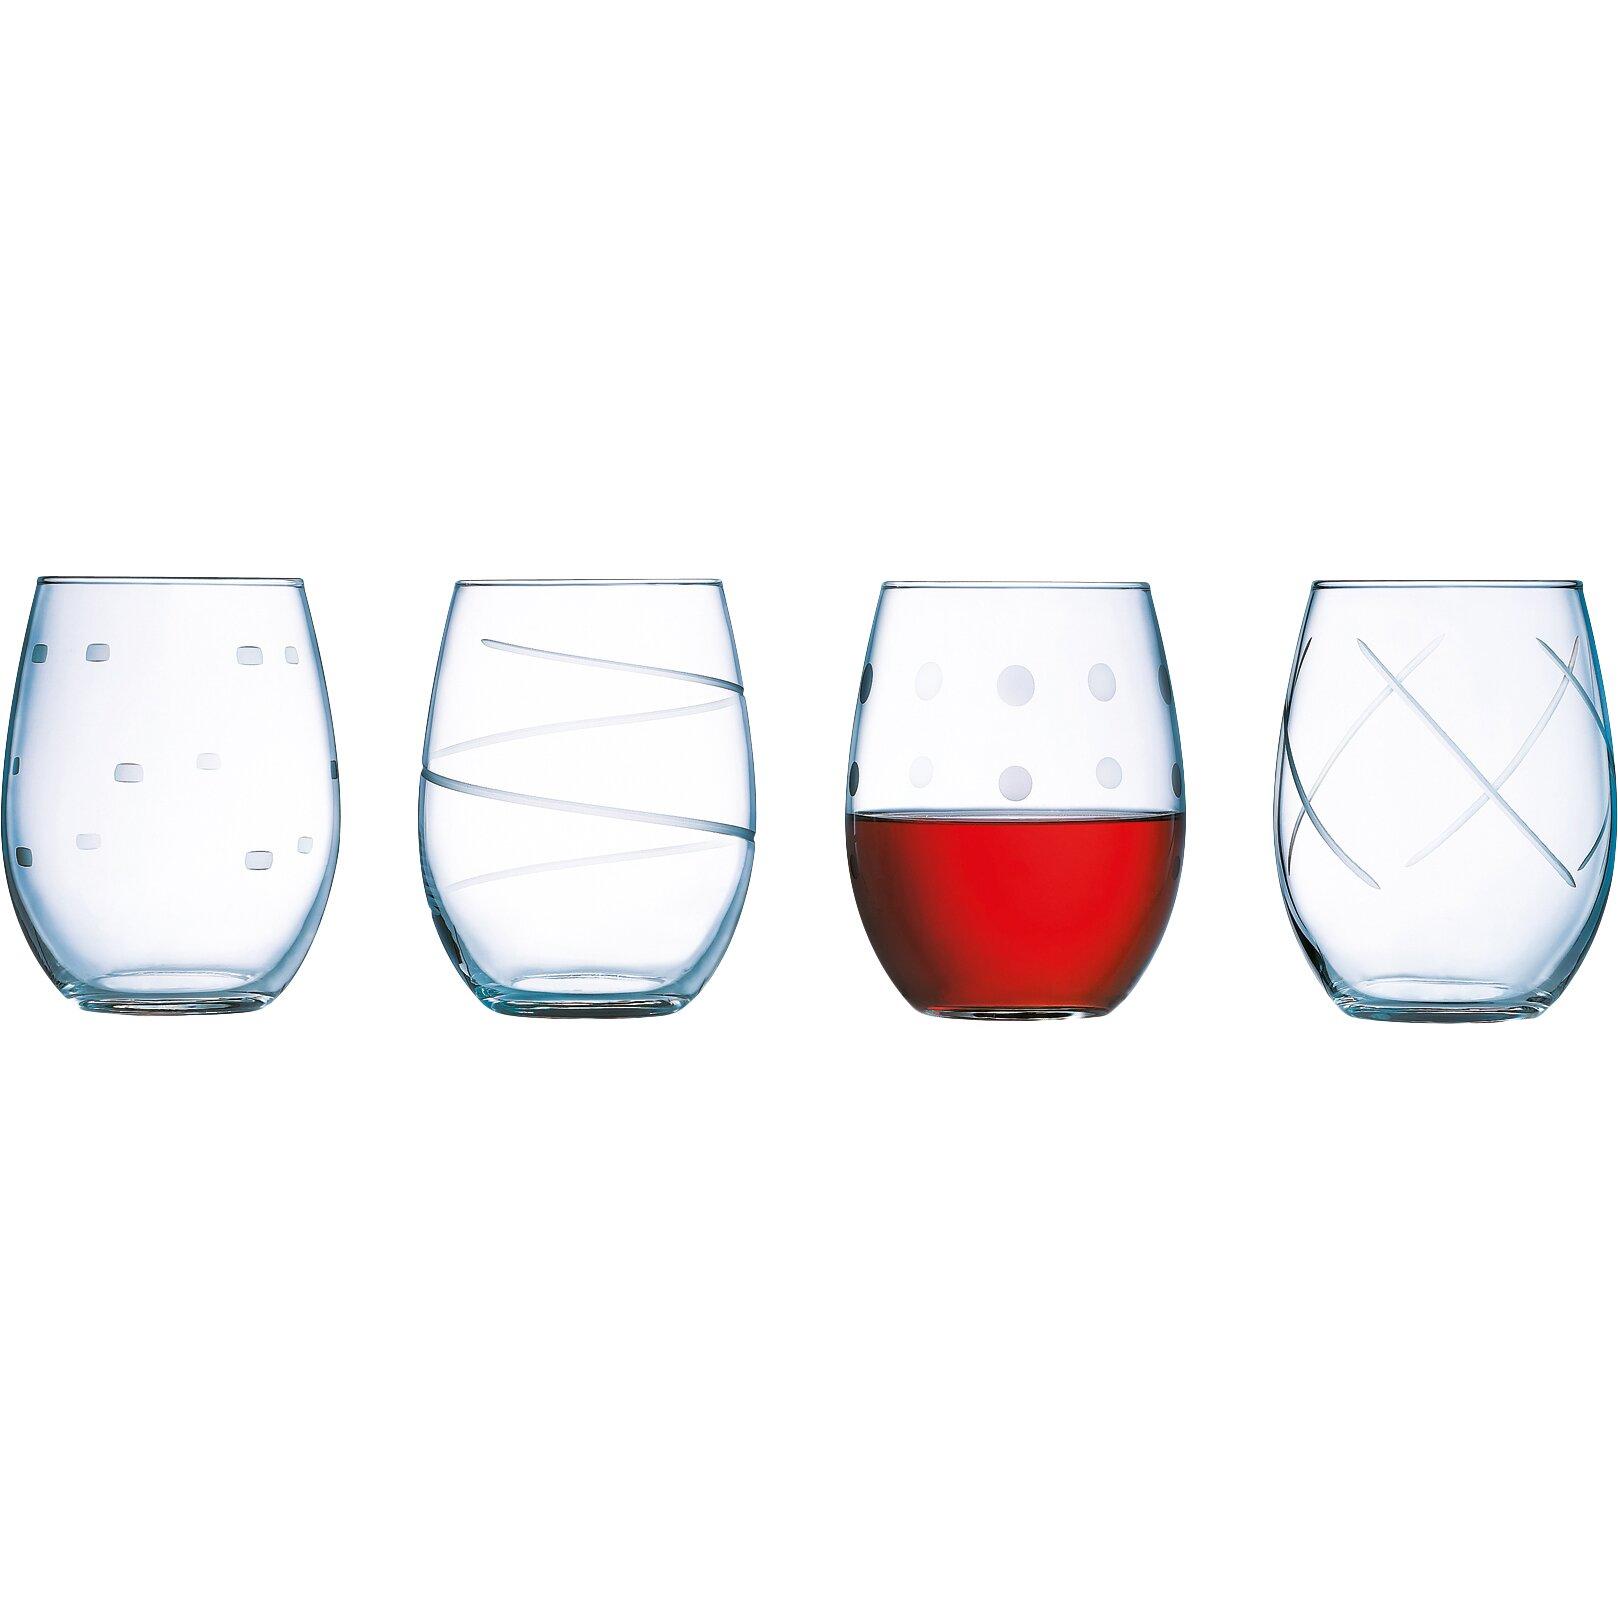 luminarc soho 21 oz stemless wine glass reviews wayfair. Black Bedroom Furniture Sets. Home Design Ideas